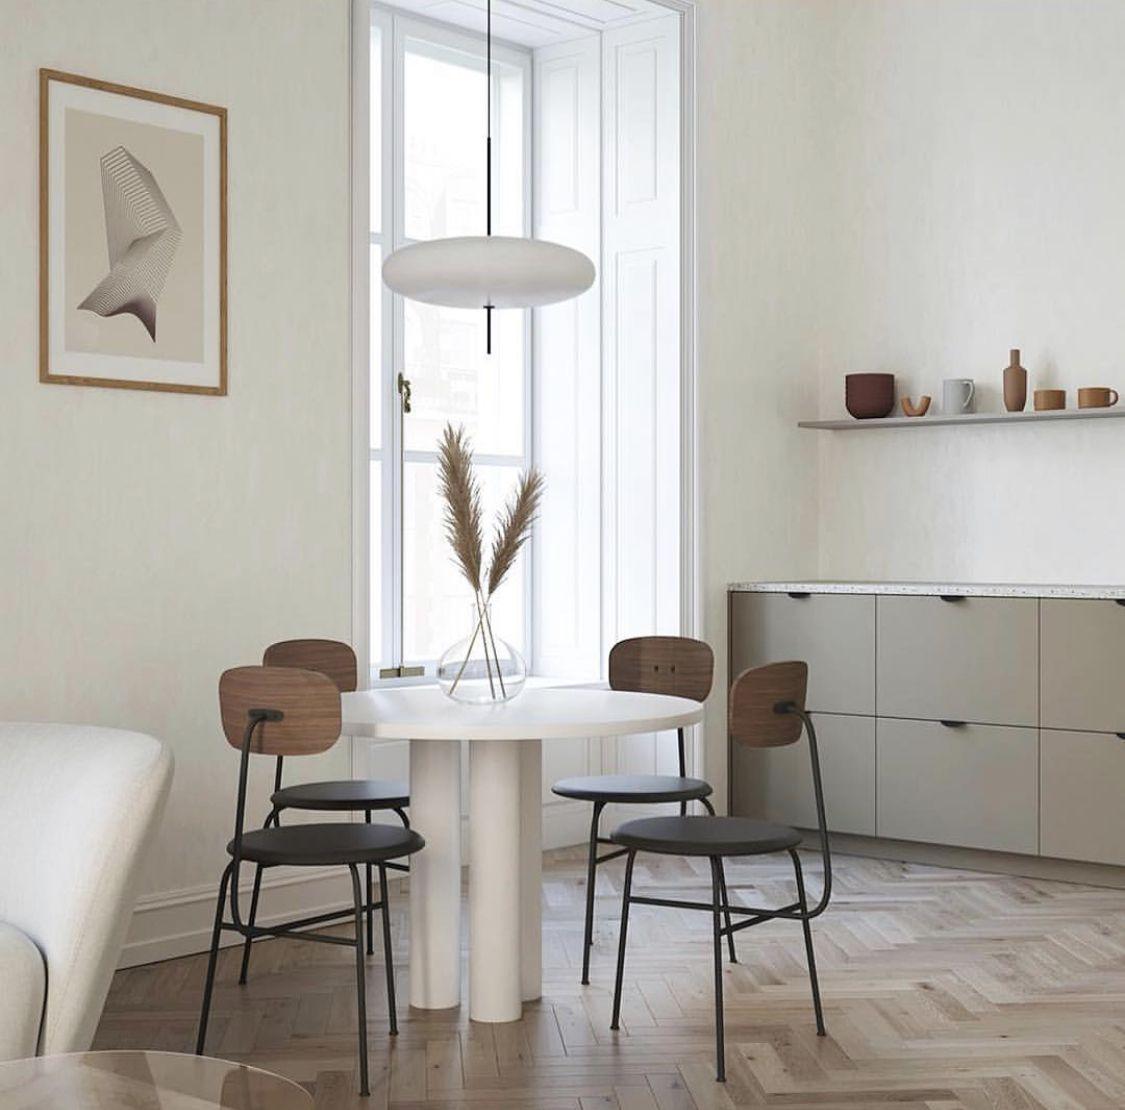 Pin di Lila Savini su Frankrike | Arredamento d'interni